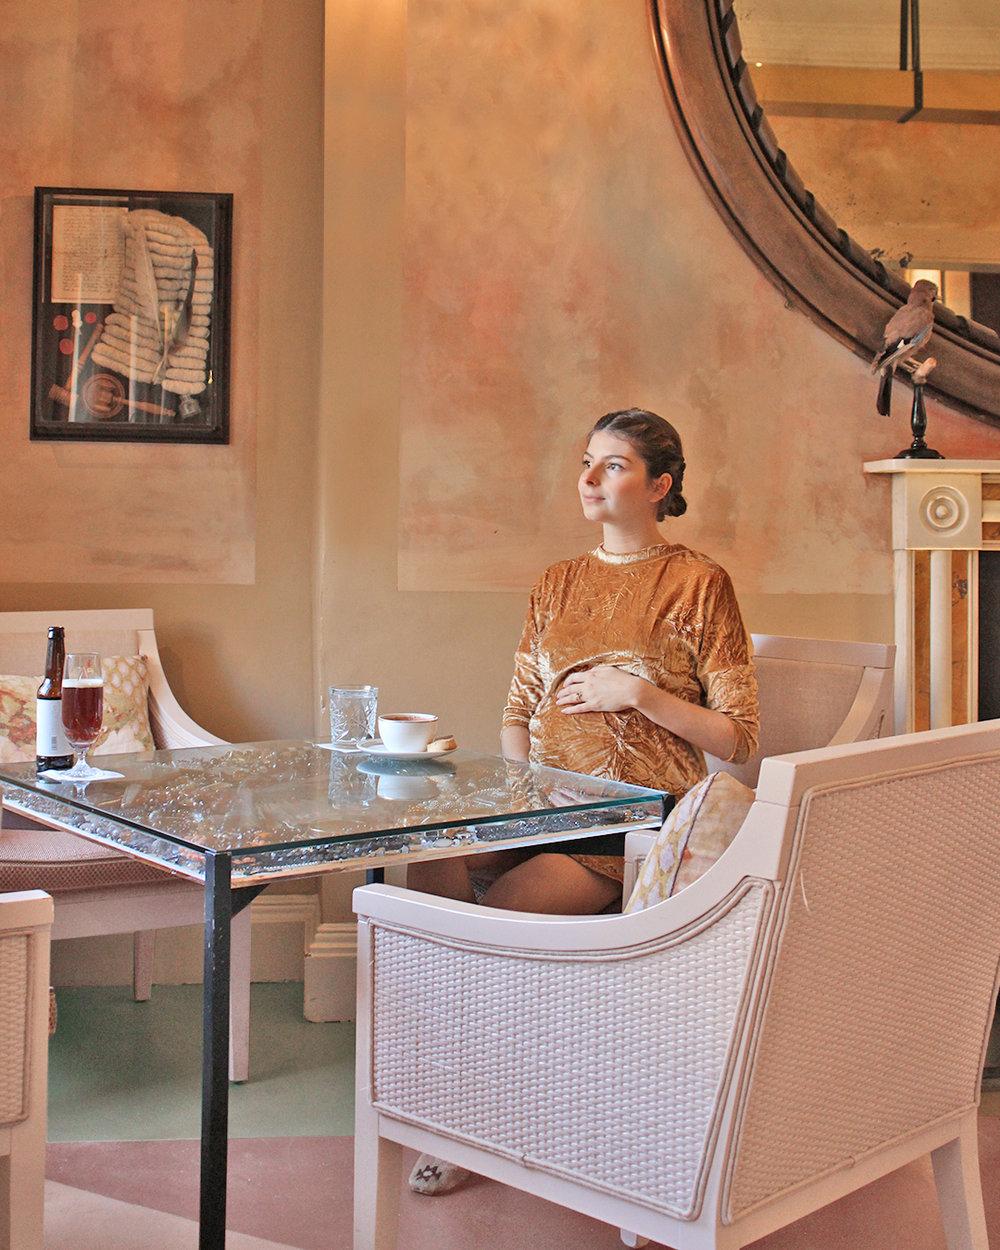 visit-bath-mini-break-nancy-straughan-blog-stylist.jpg